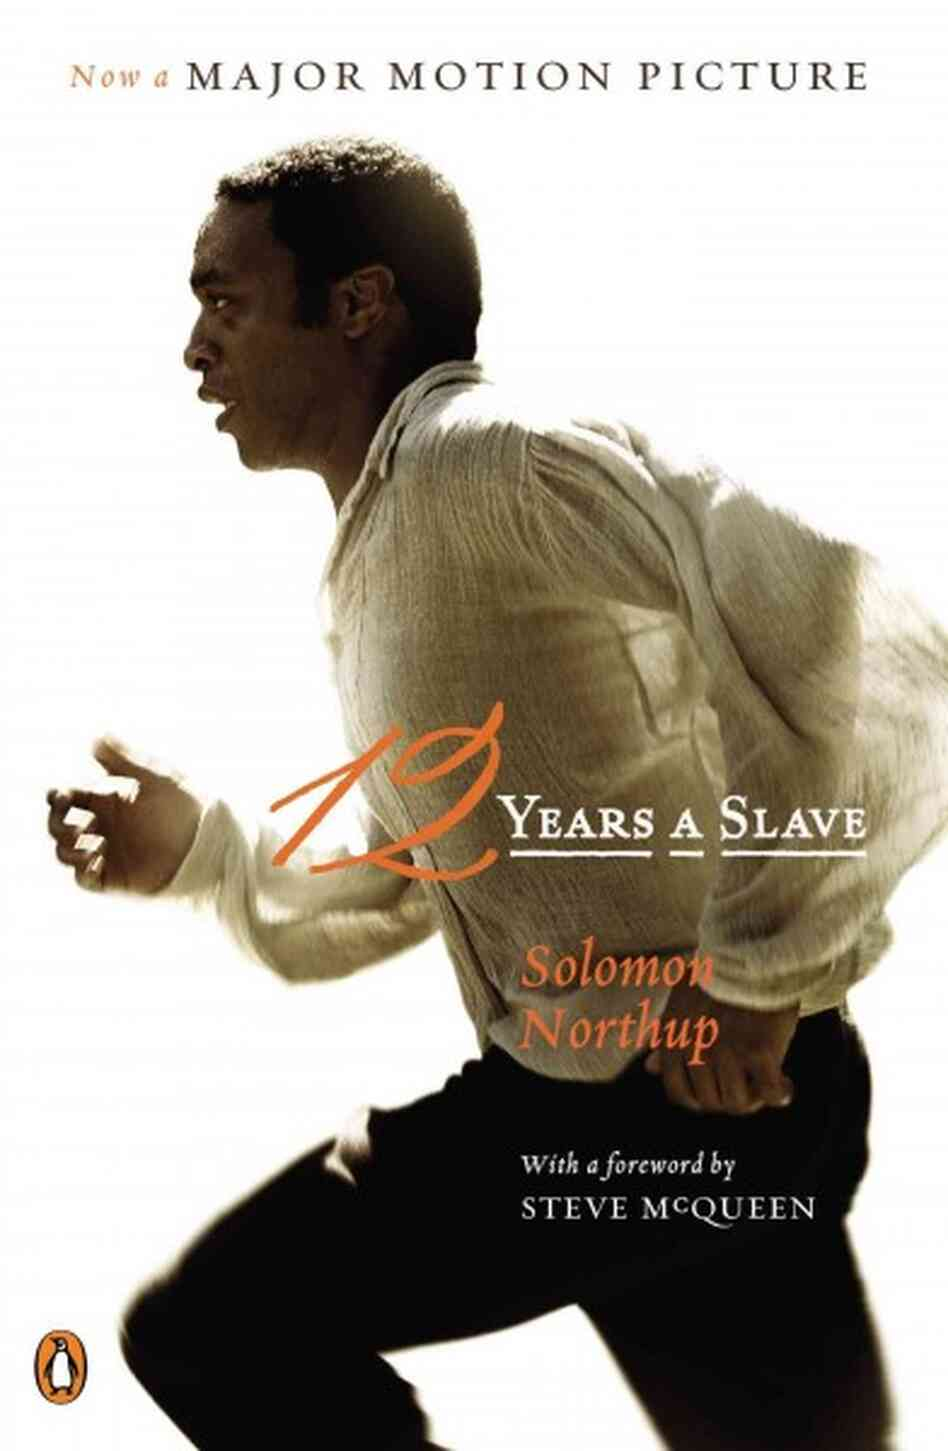 12 years a slave buch